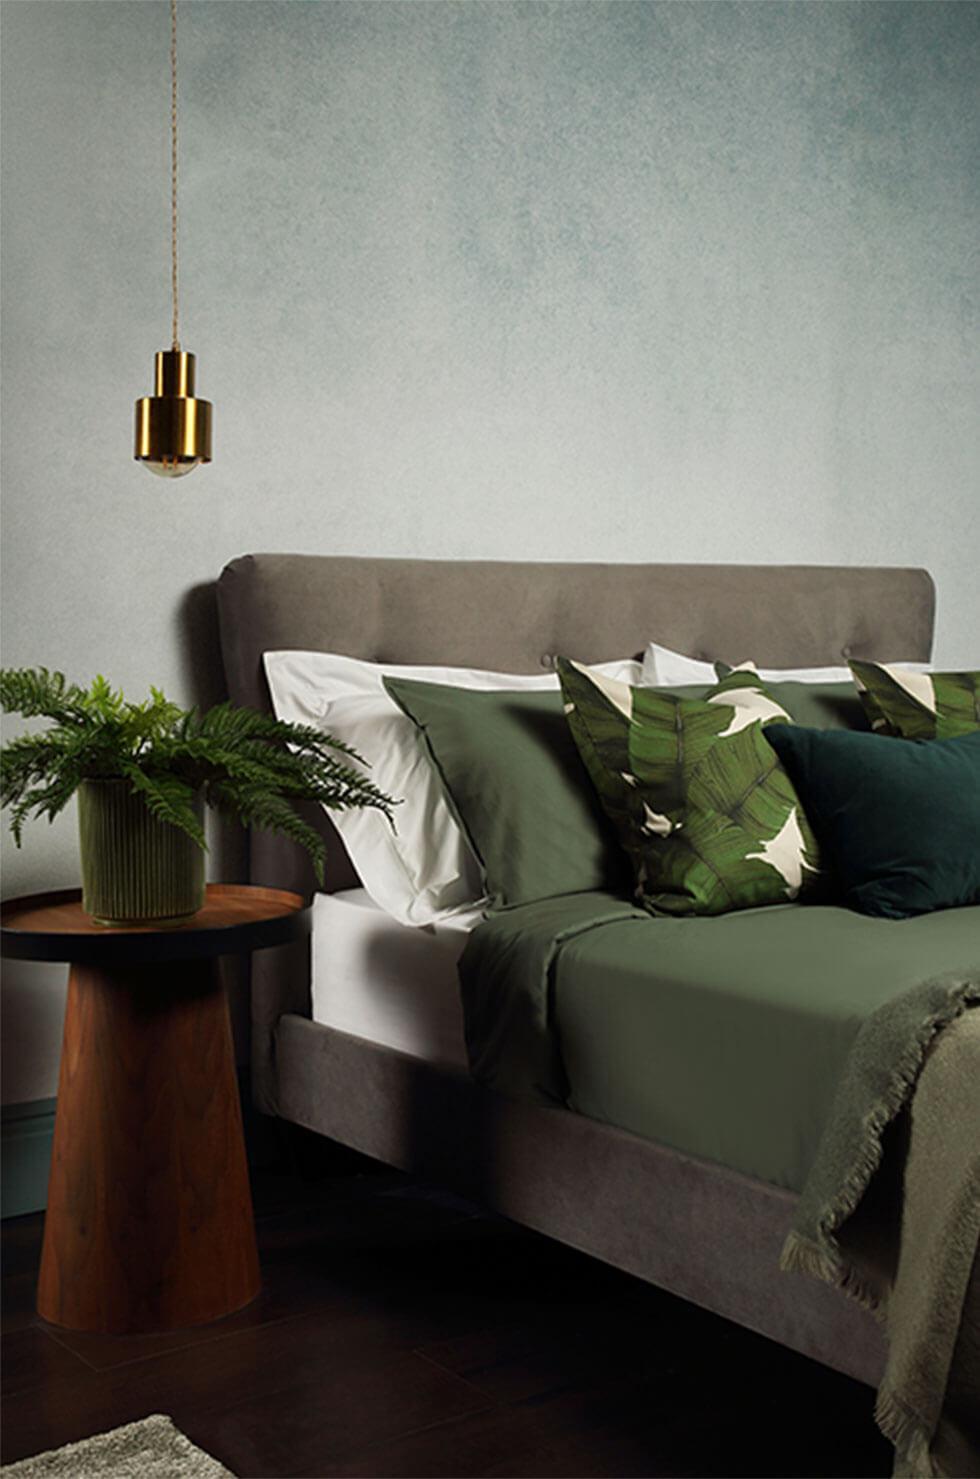 Grey velvet bed, green pillows in a grey bedroom.